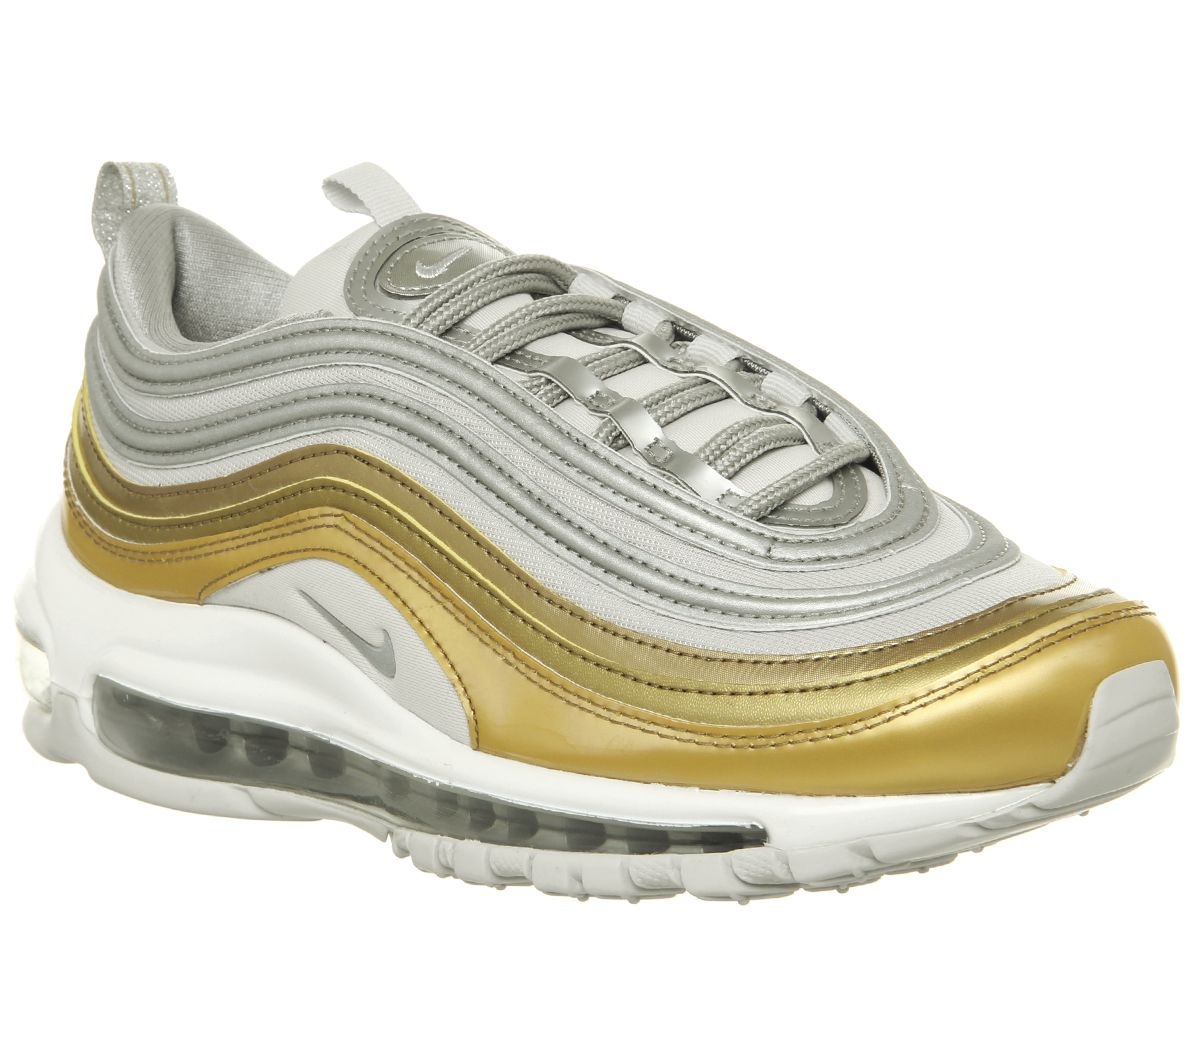 d5270485eaaf10 Nike Air Max 97 Trainers Vast Grey Mtlc Silver Gold Summit White ...